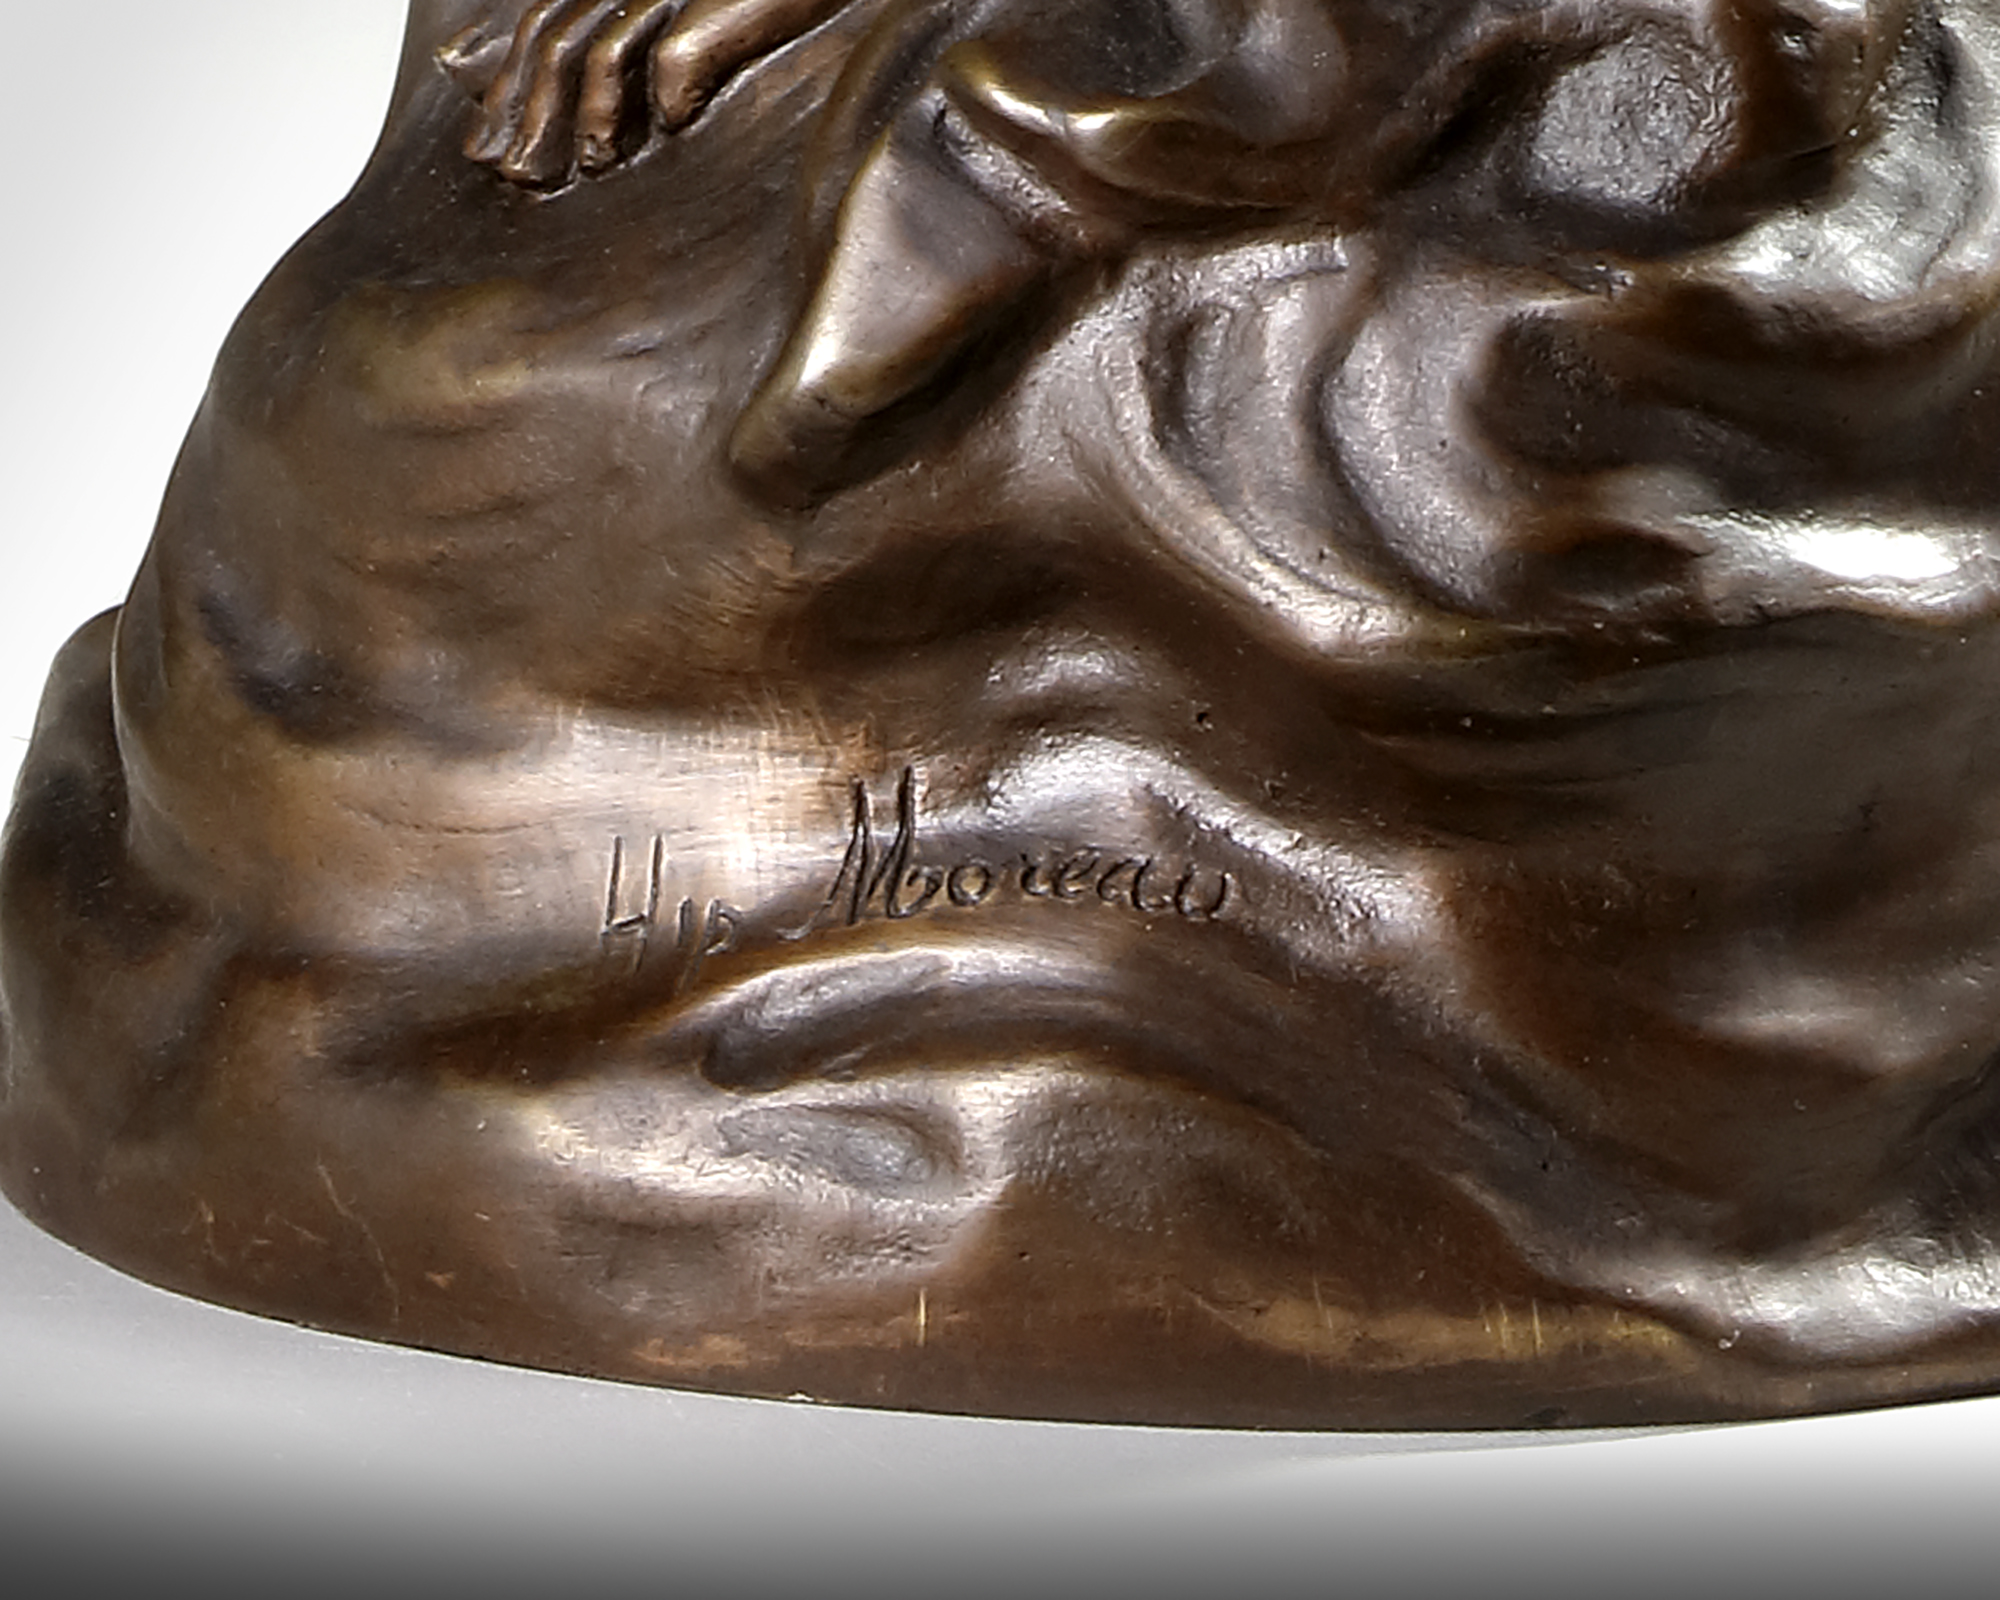 A FRENCH CLOCK SET, SIGNED HIPPOLYTE MOREAU - Image 9 of 11